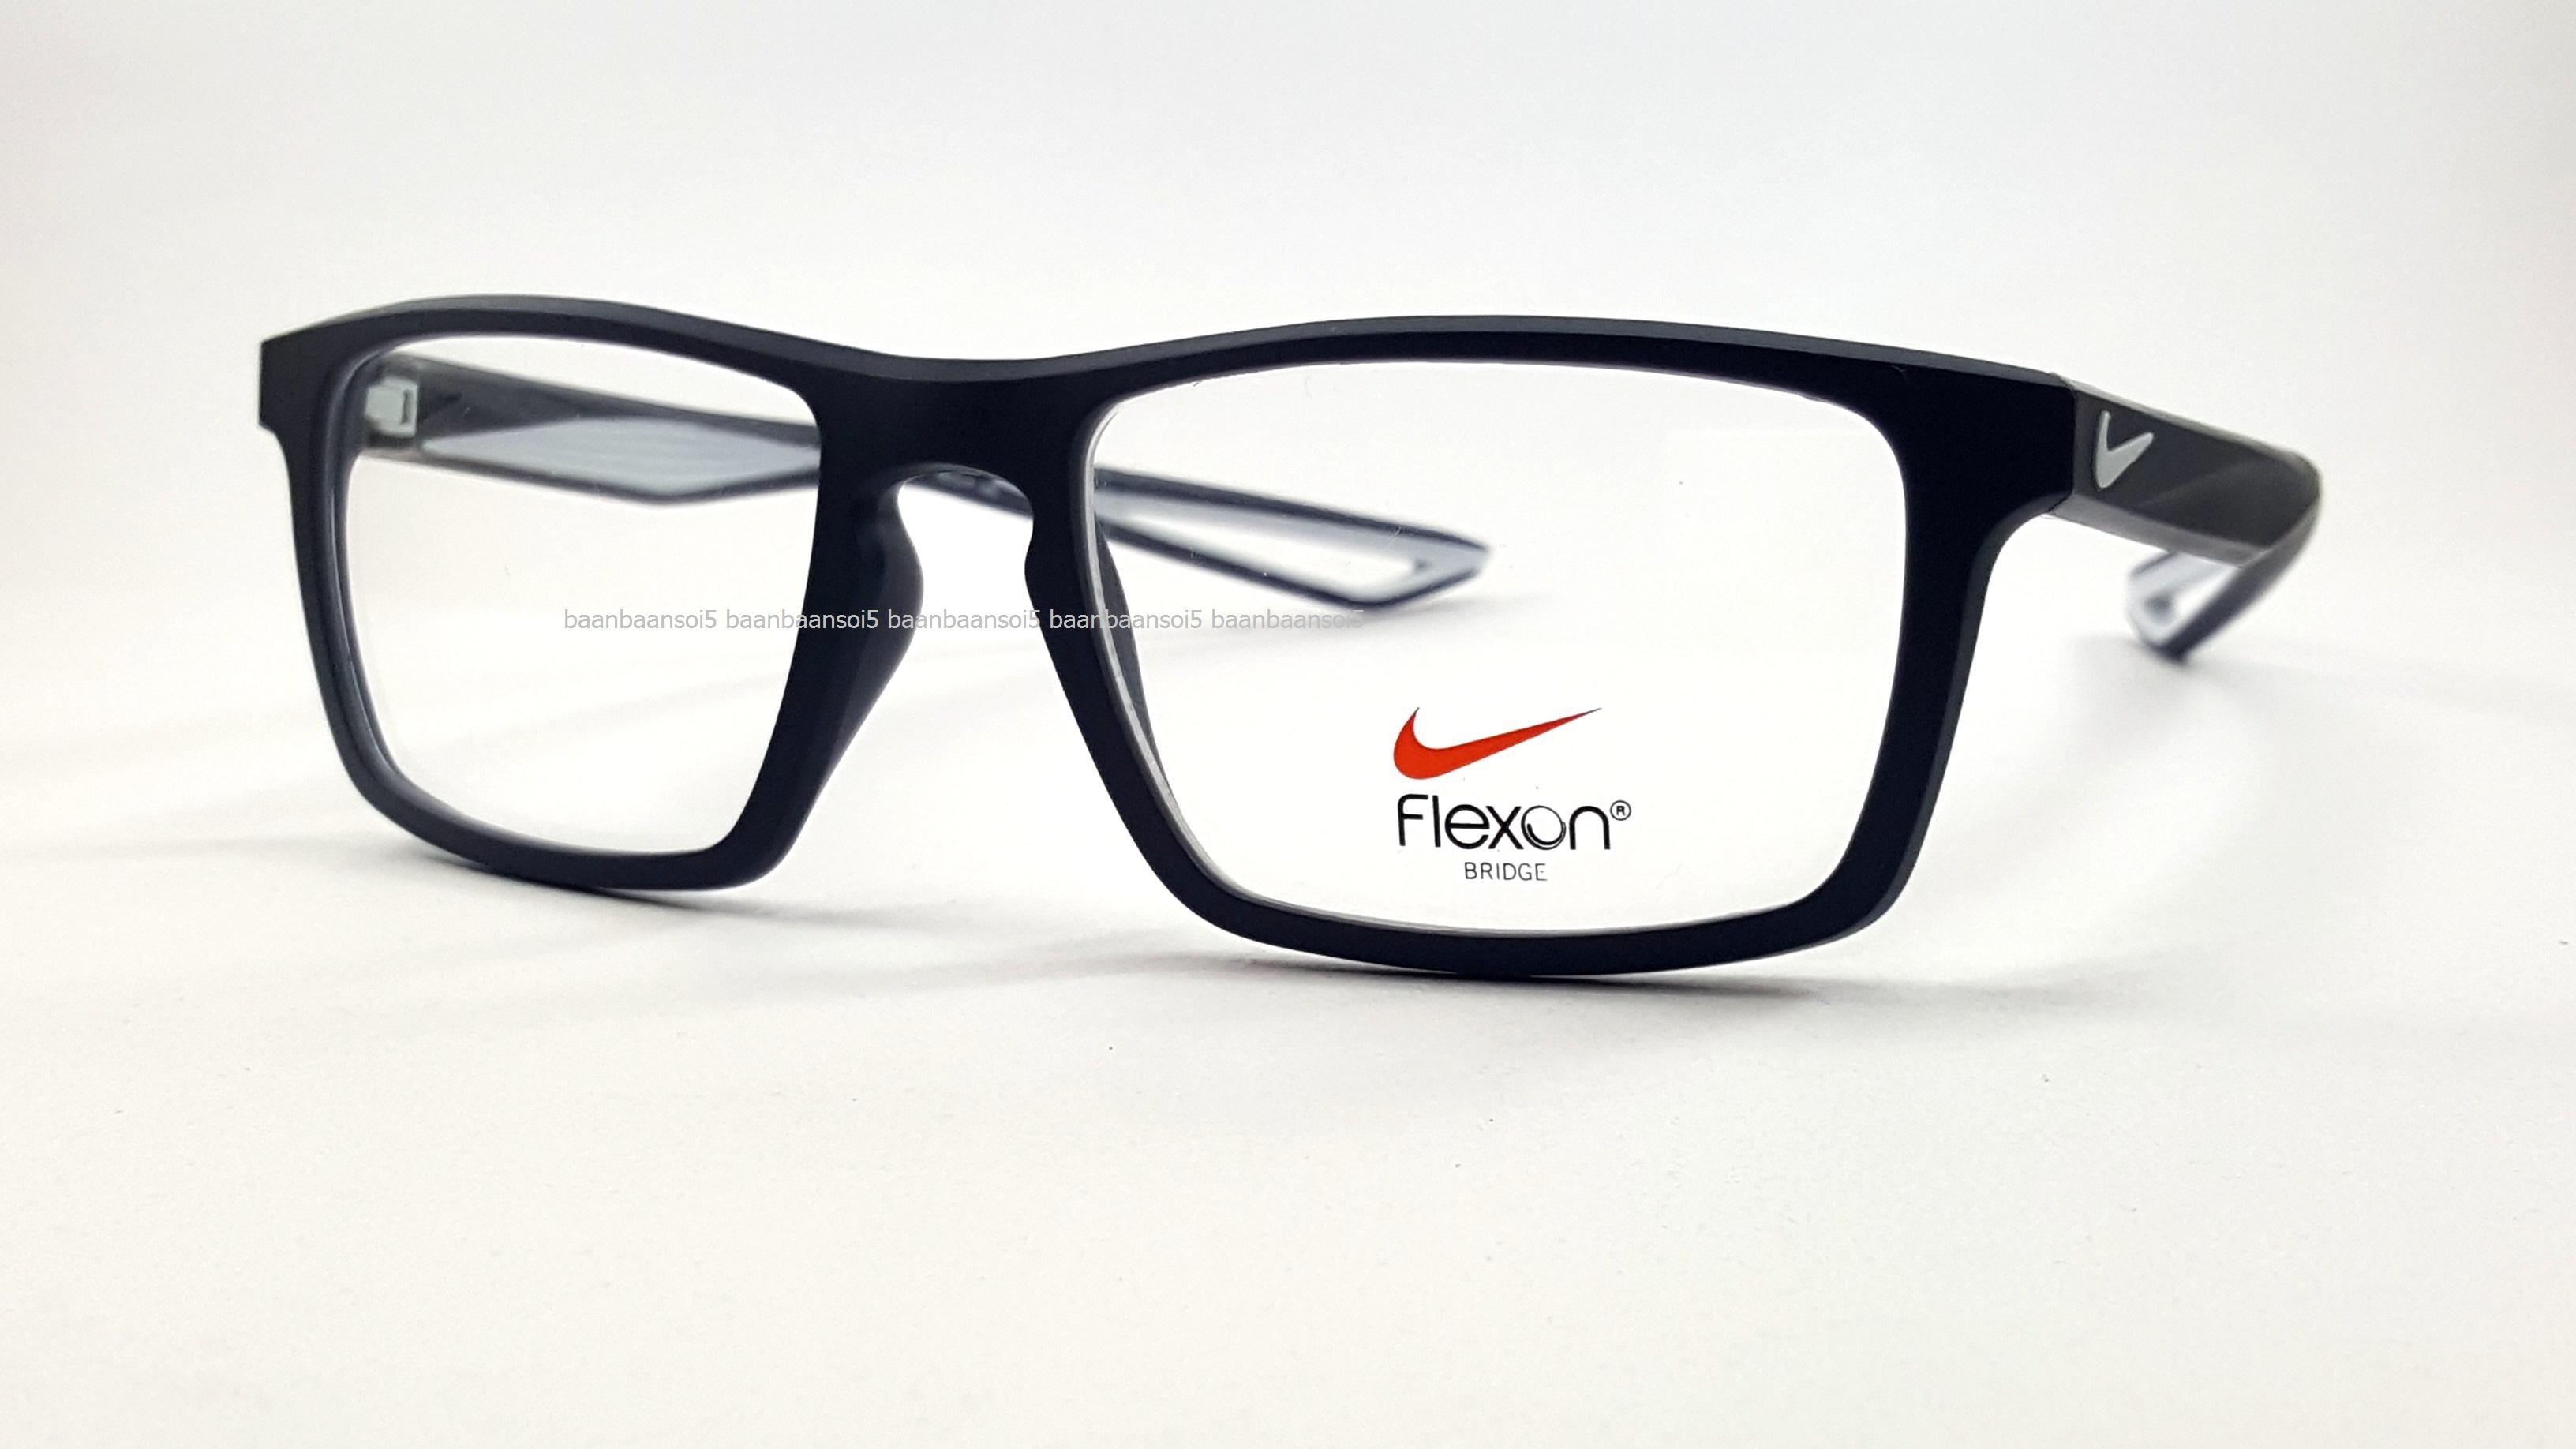 348930e79fd44 NIKE BRAND ORIGINALแท้ Flexon 4280 034 กรอบแว่นตาพร้อมเลนส์ มัลติโค๊ตHOYA  ป้องกัน